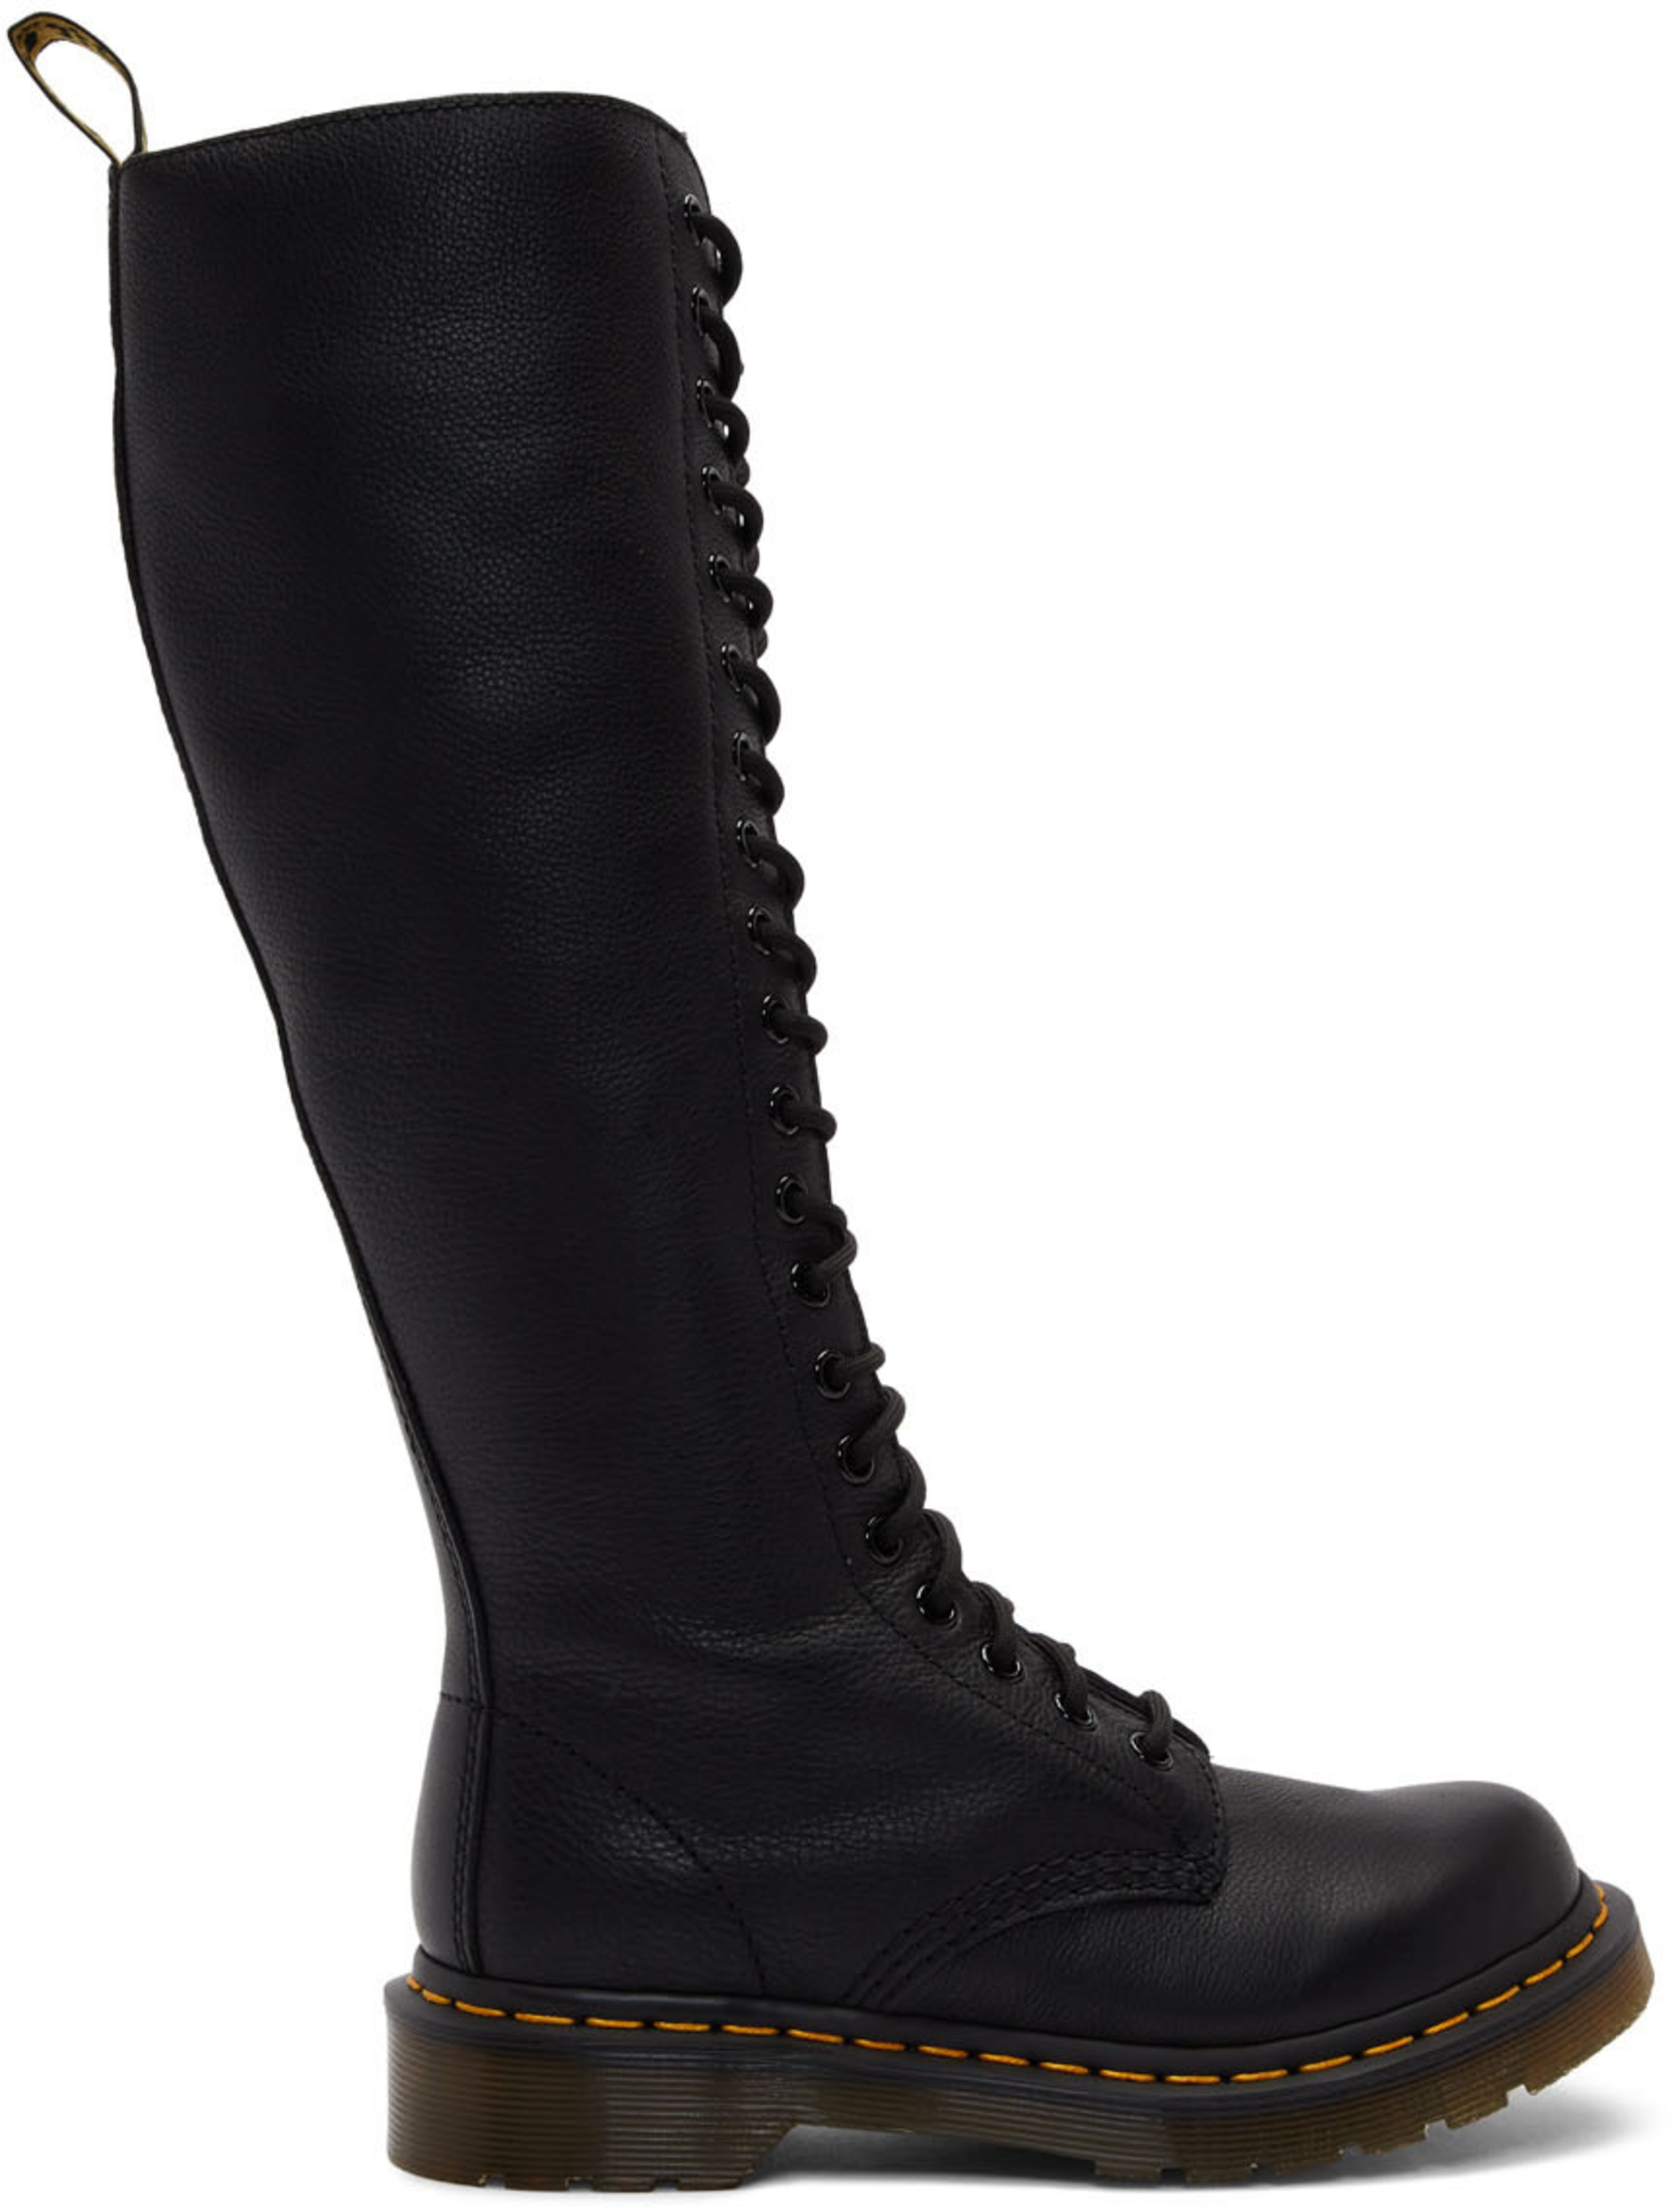 Boots Cuir 2976 SnowplowDr 2976 Boots SnowplowDr Martens Cuir thrdxCBsQo